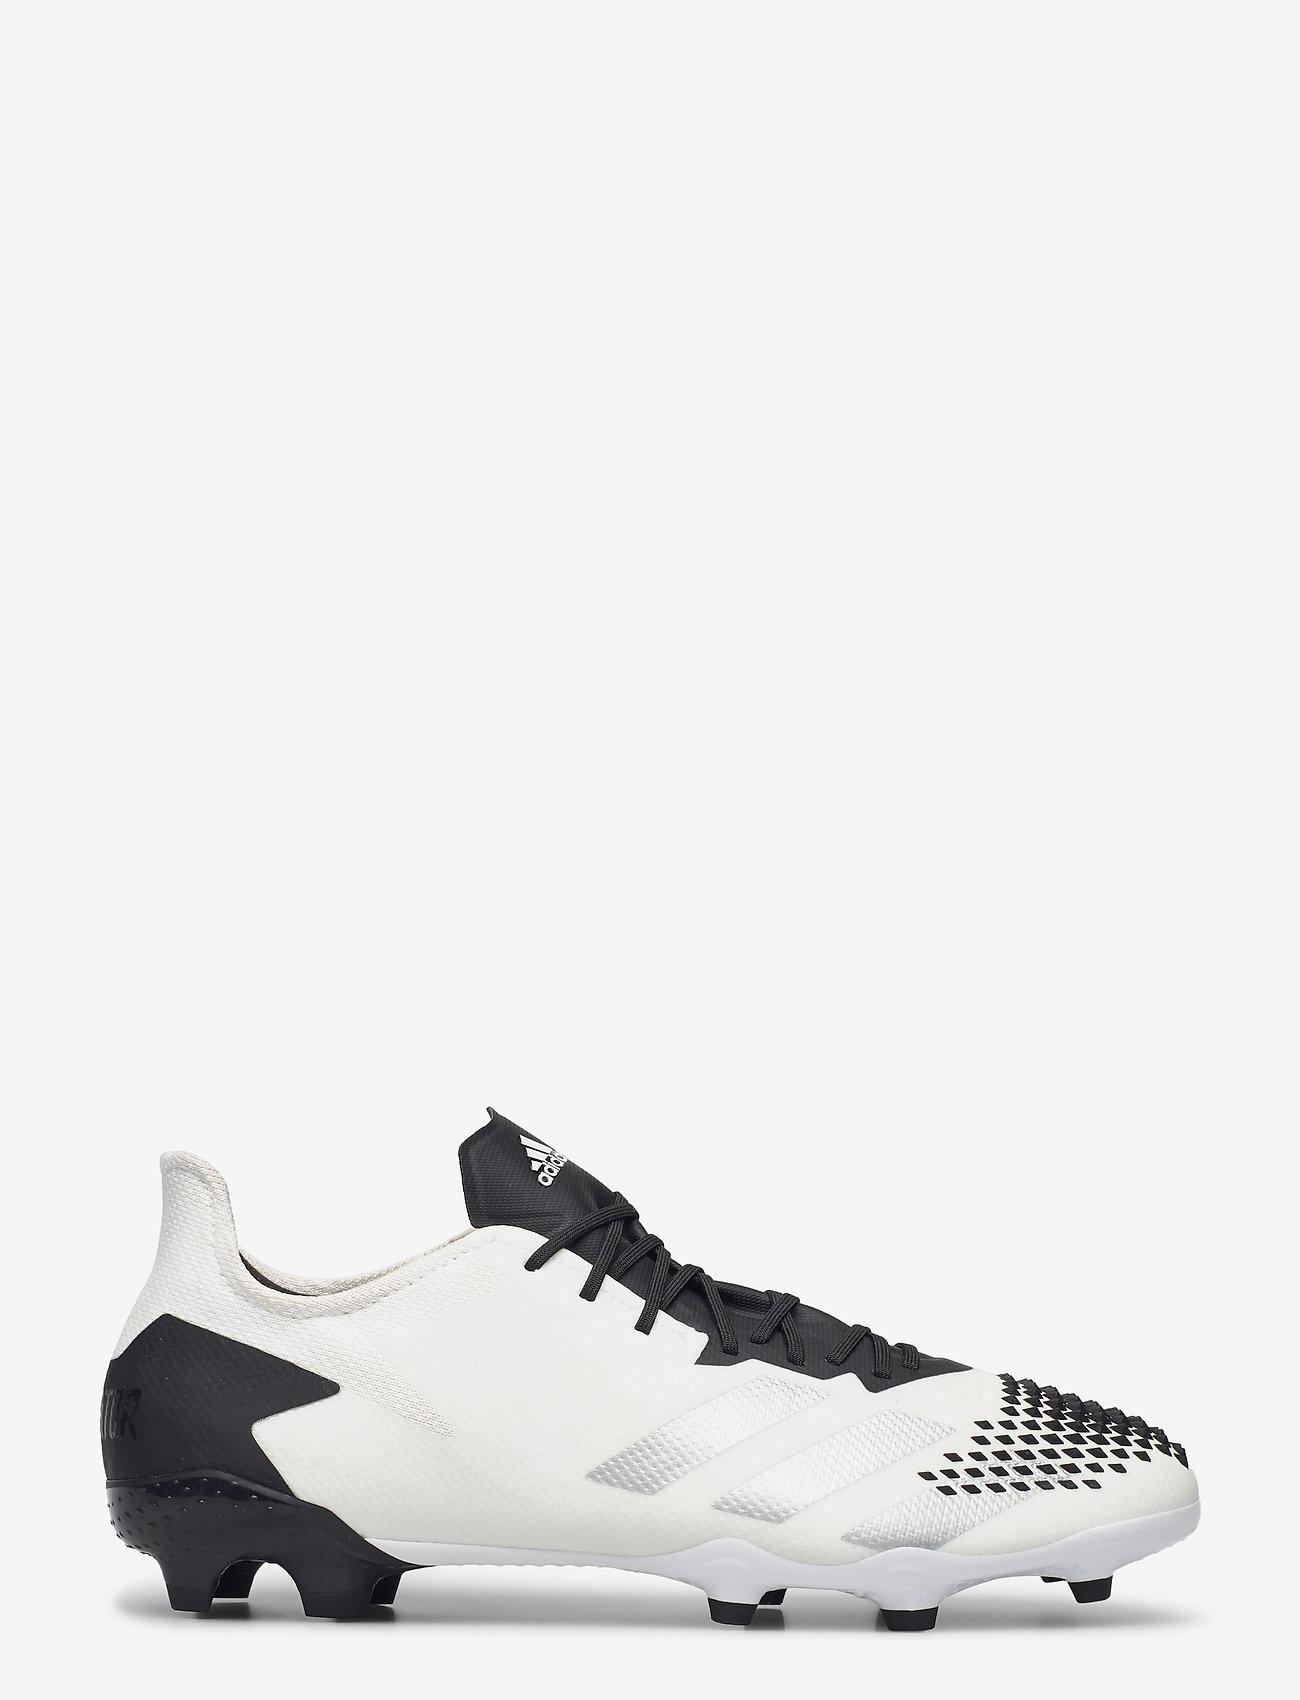 adidas Performance - PREDATOR 20.2 FG - fotballsko - ftwwht/silvmt/cblack - 1